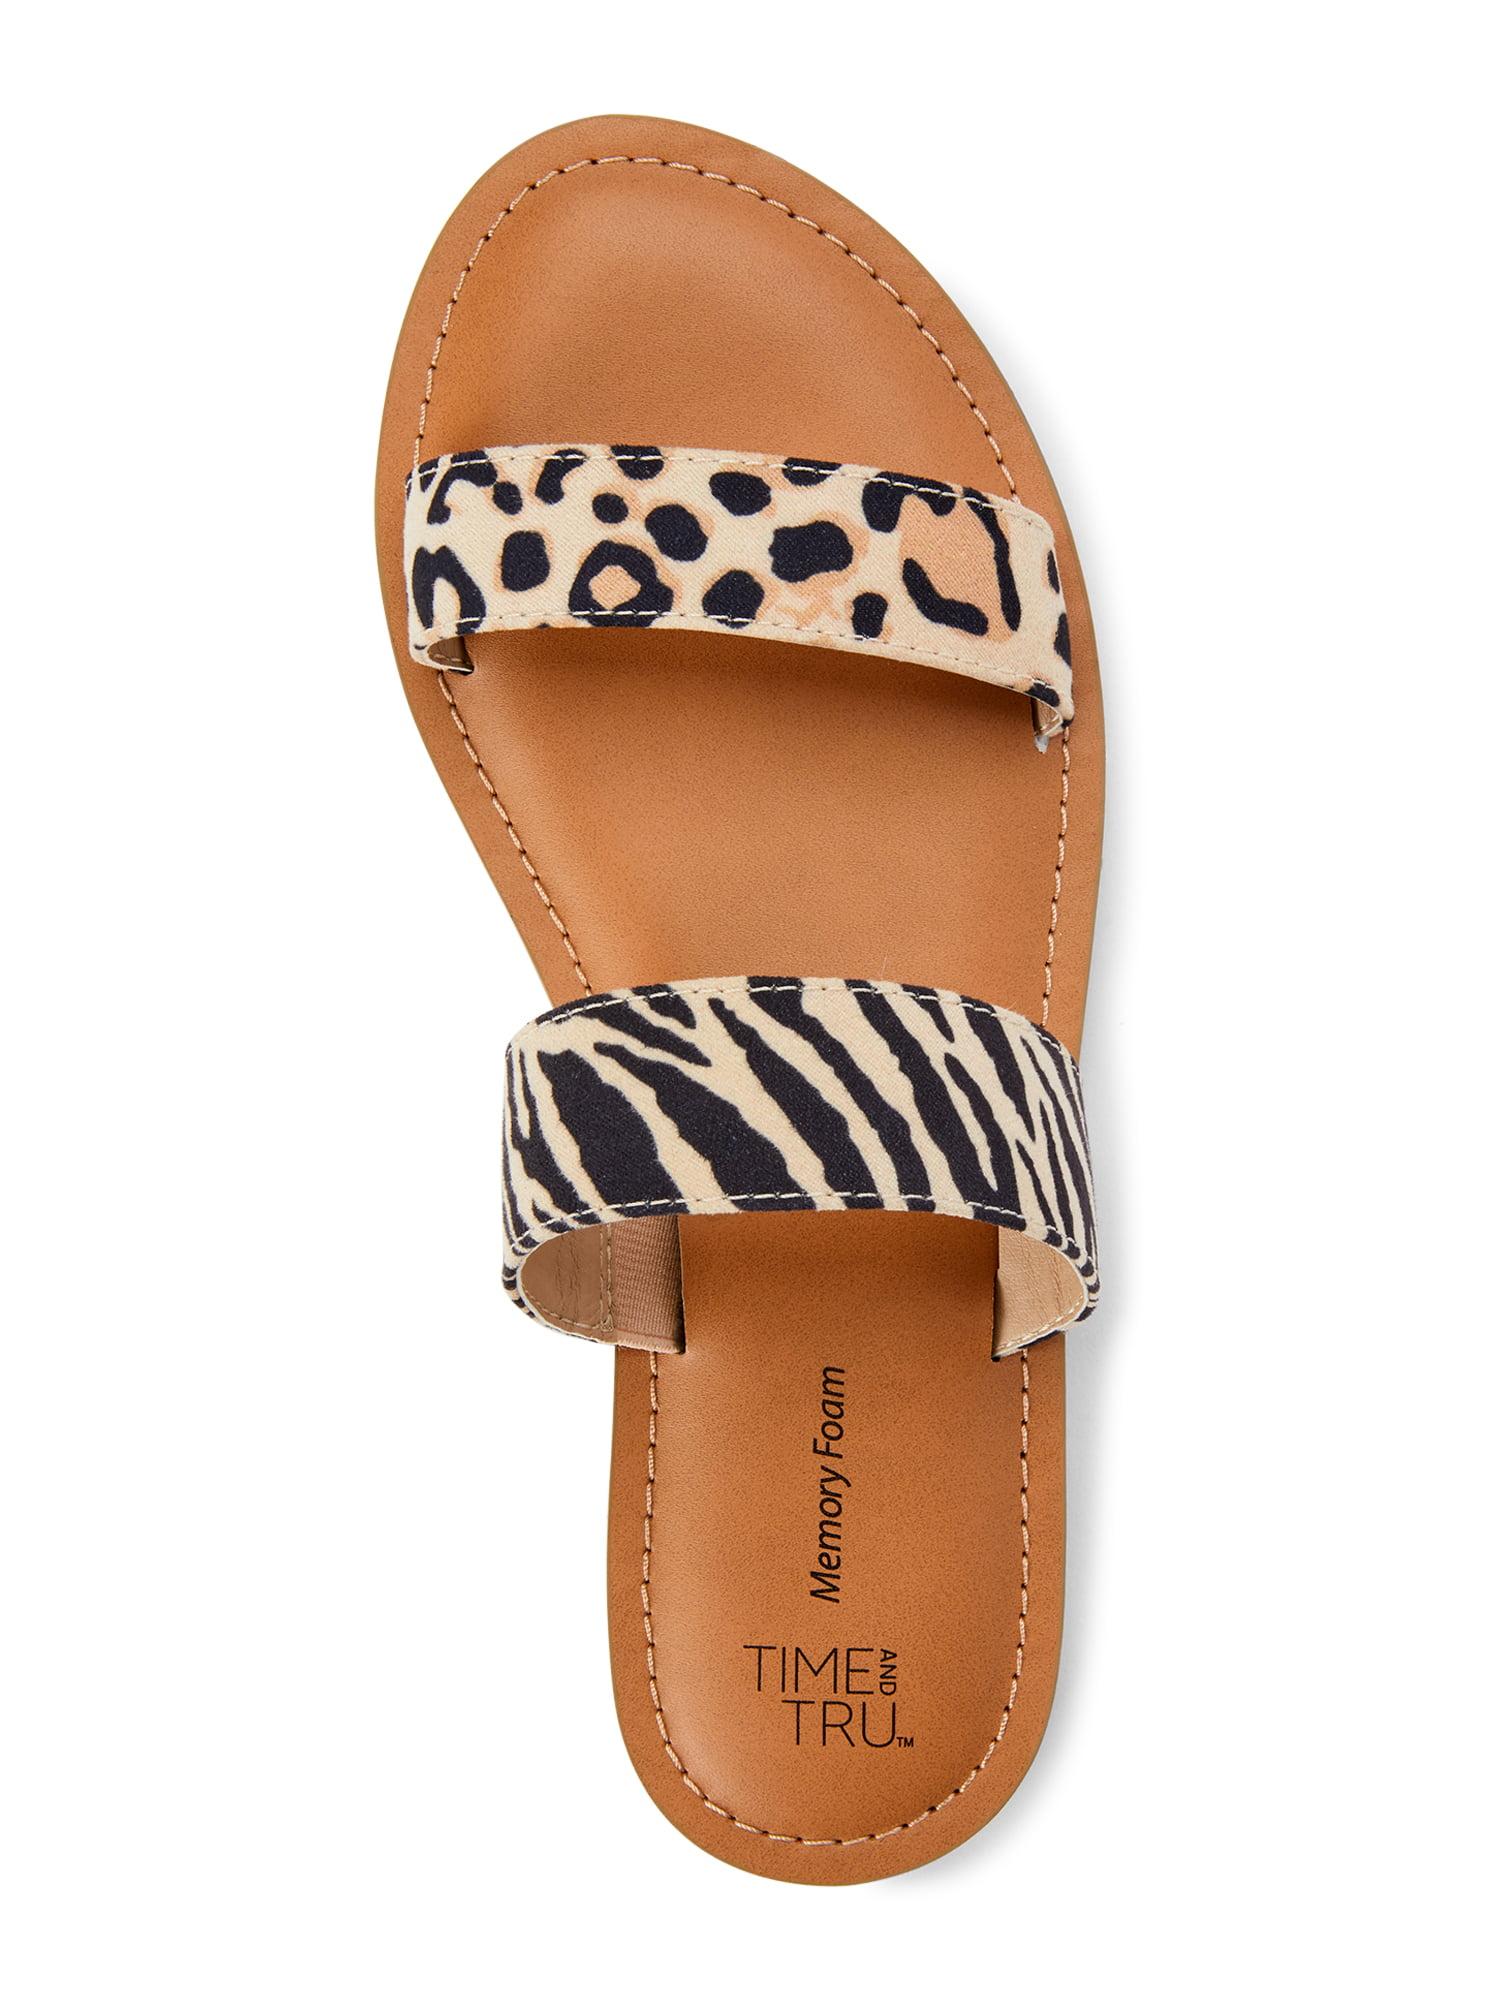 Tru Women's Two Band Sandals